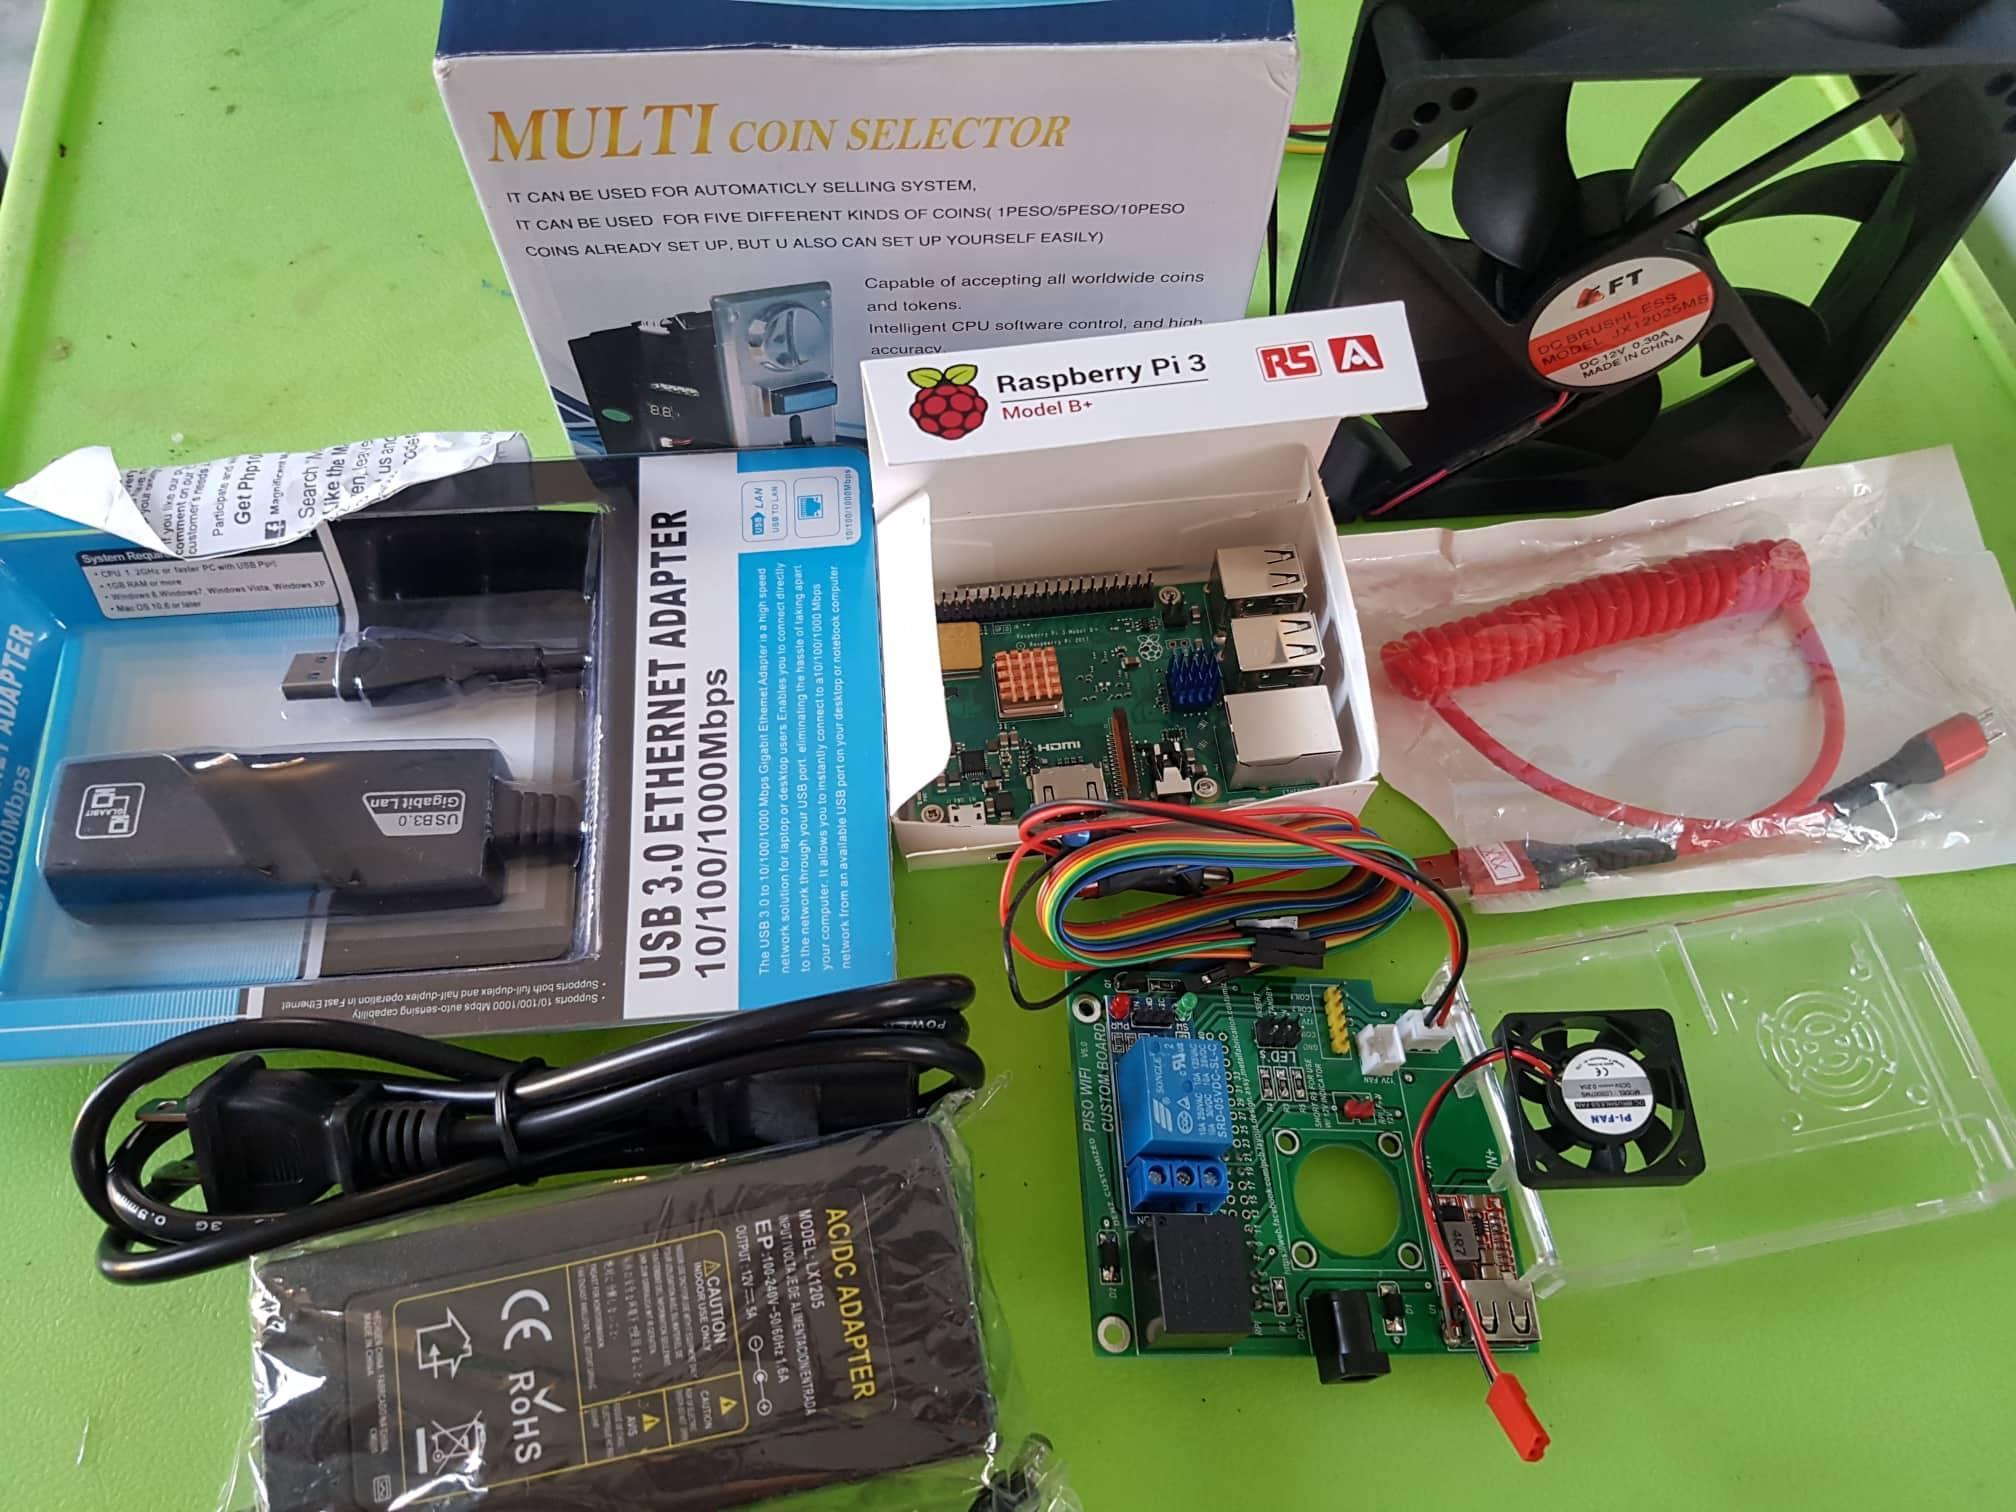 Mi-Fi Modems for sale - Mobile Mi-Fi Connection prices, brands